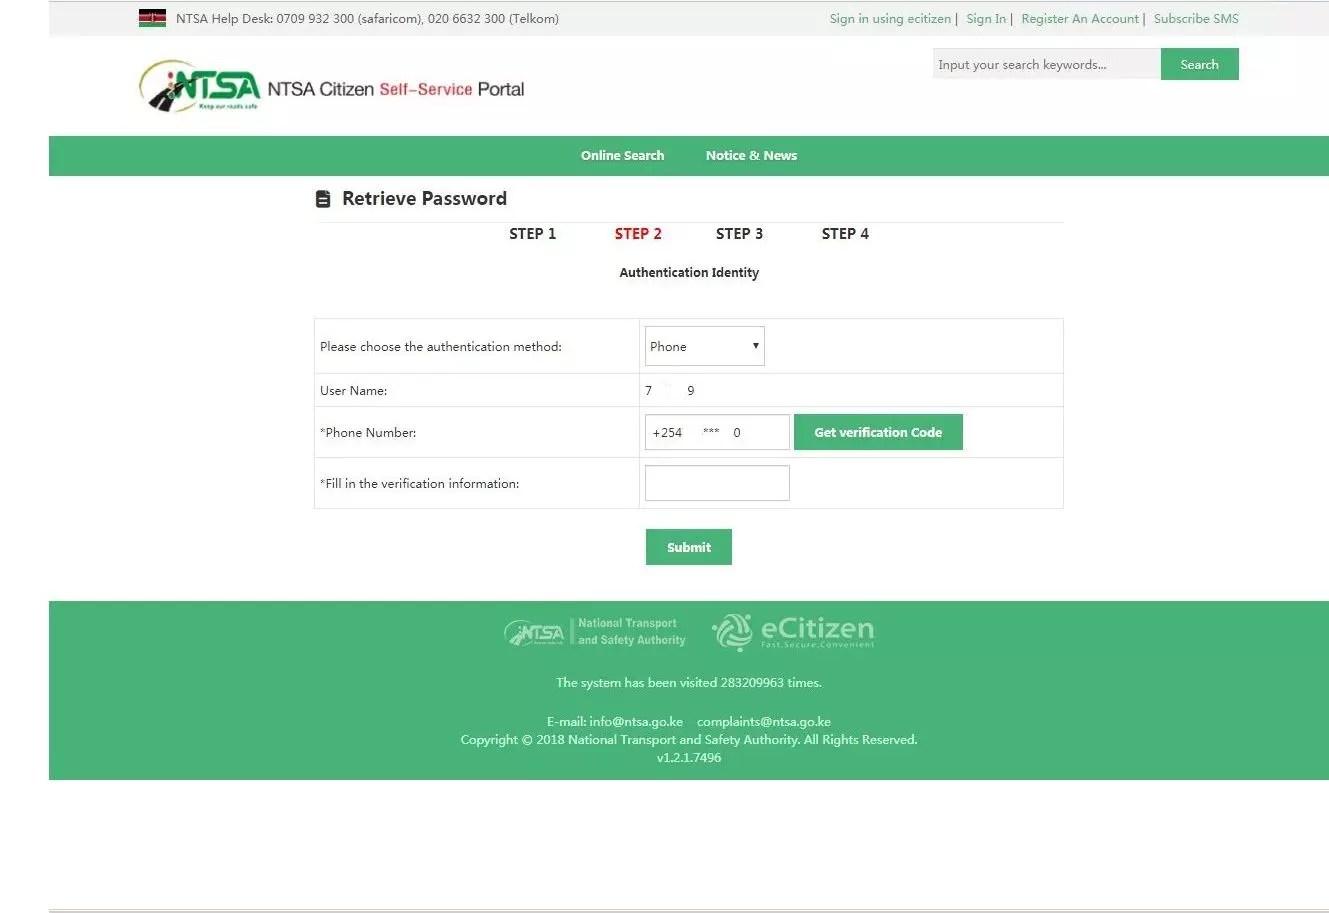 ntsa tims authentication identity